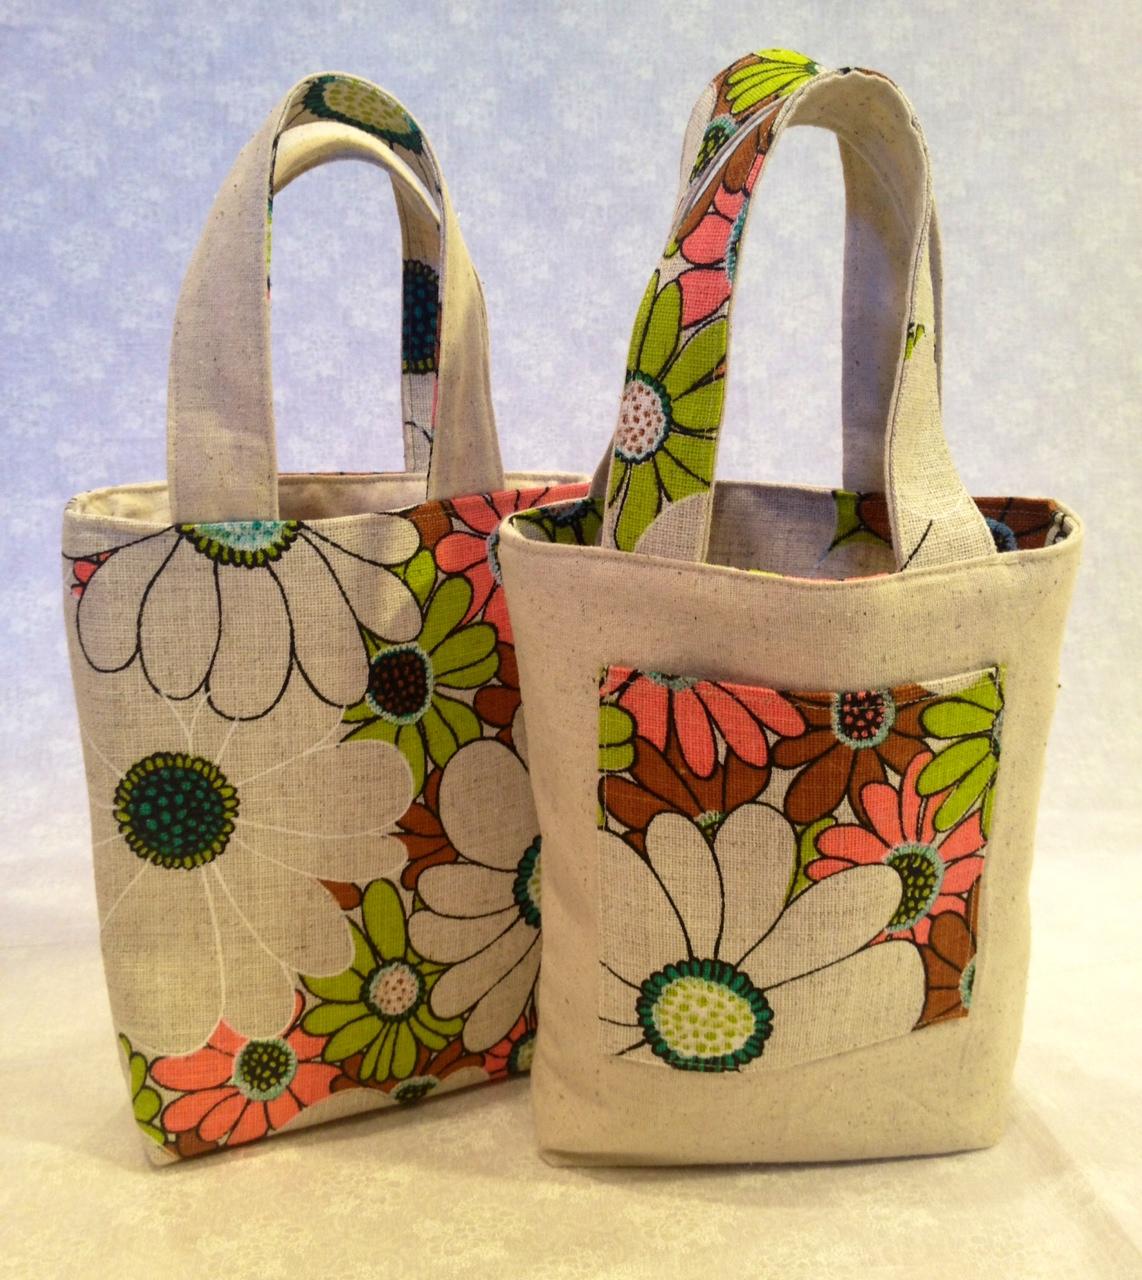 Reversible Tote Bags How To Make One Noelleodesigns